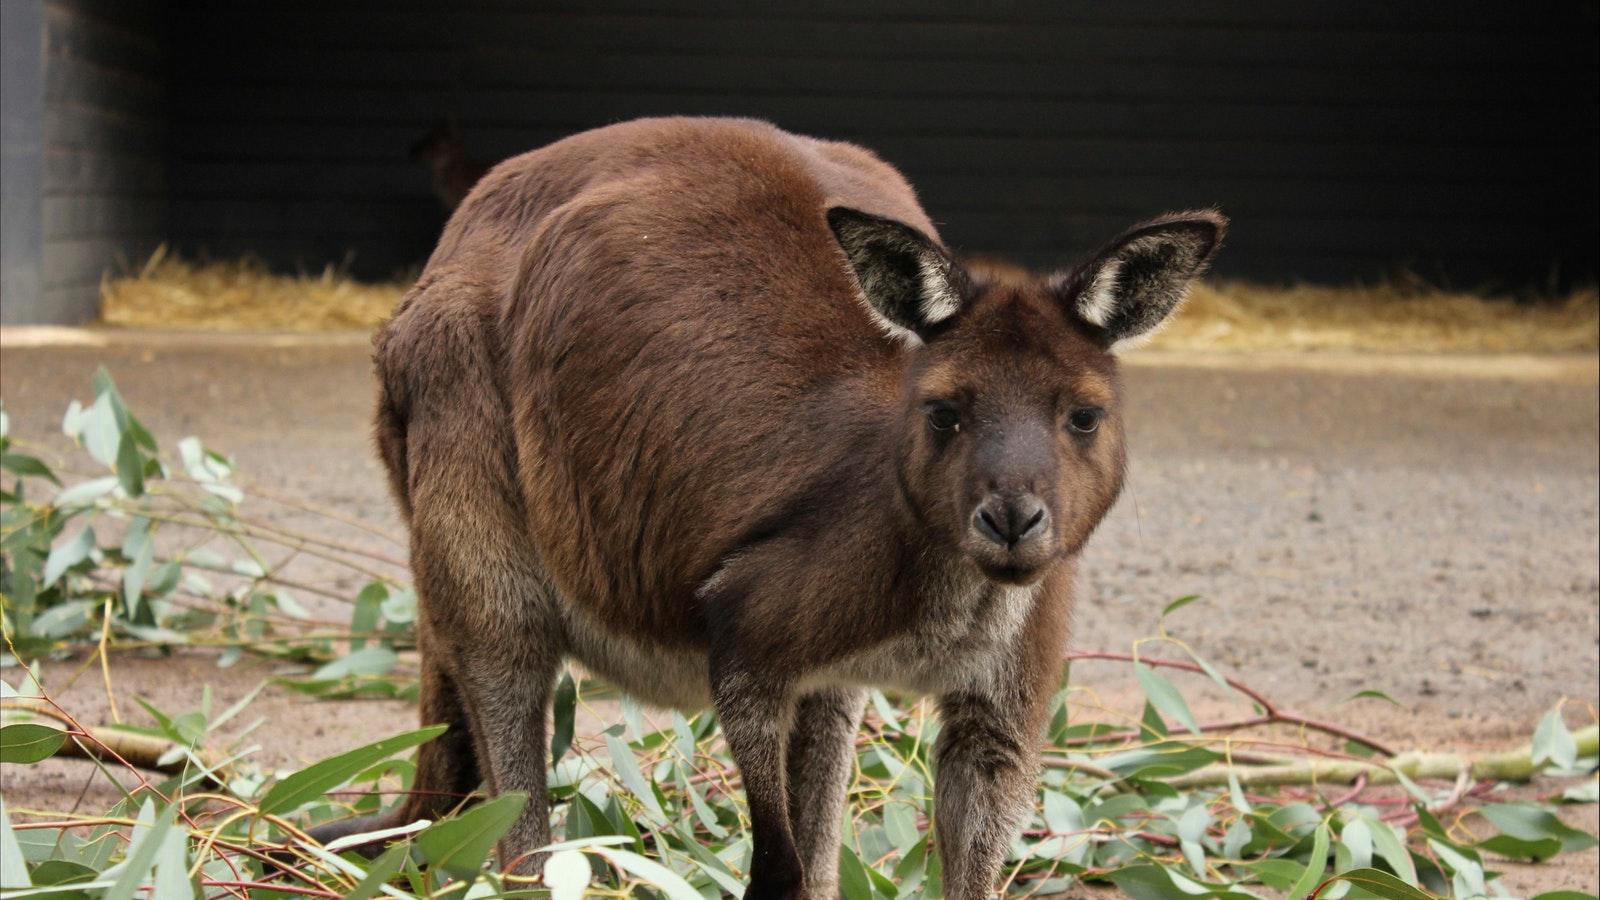 Sanctuary Resident Kangaroo